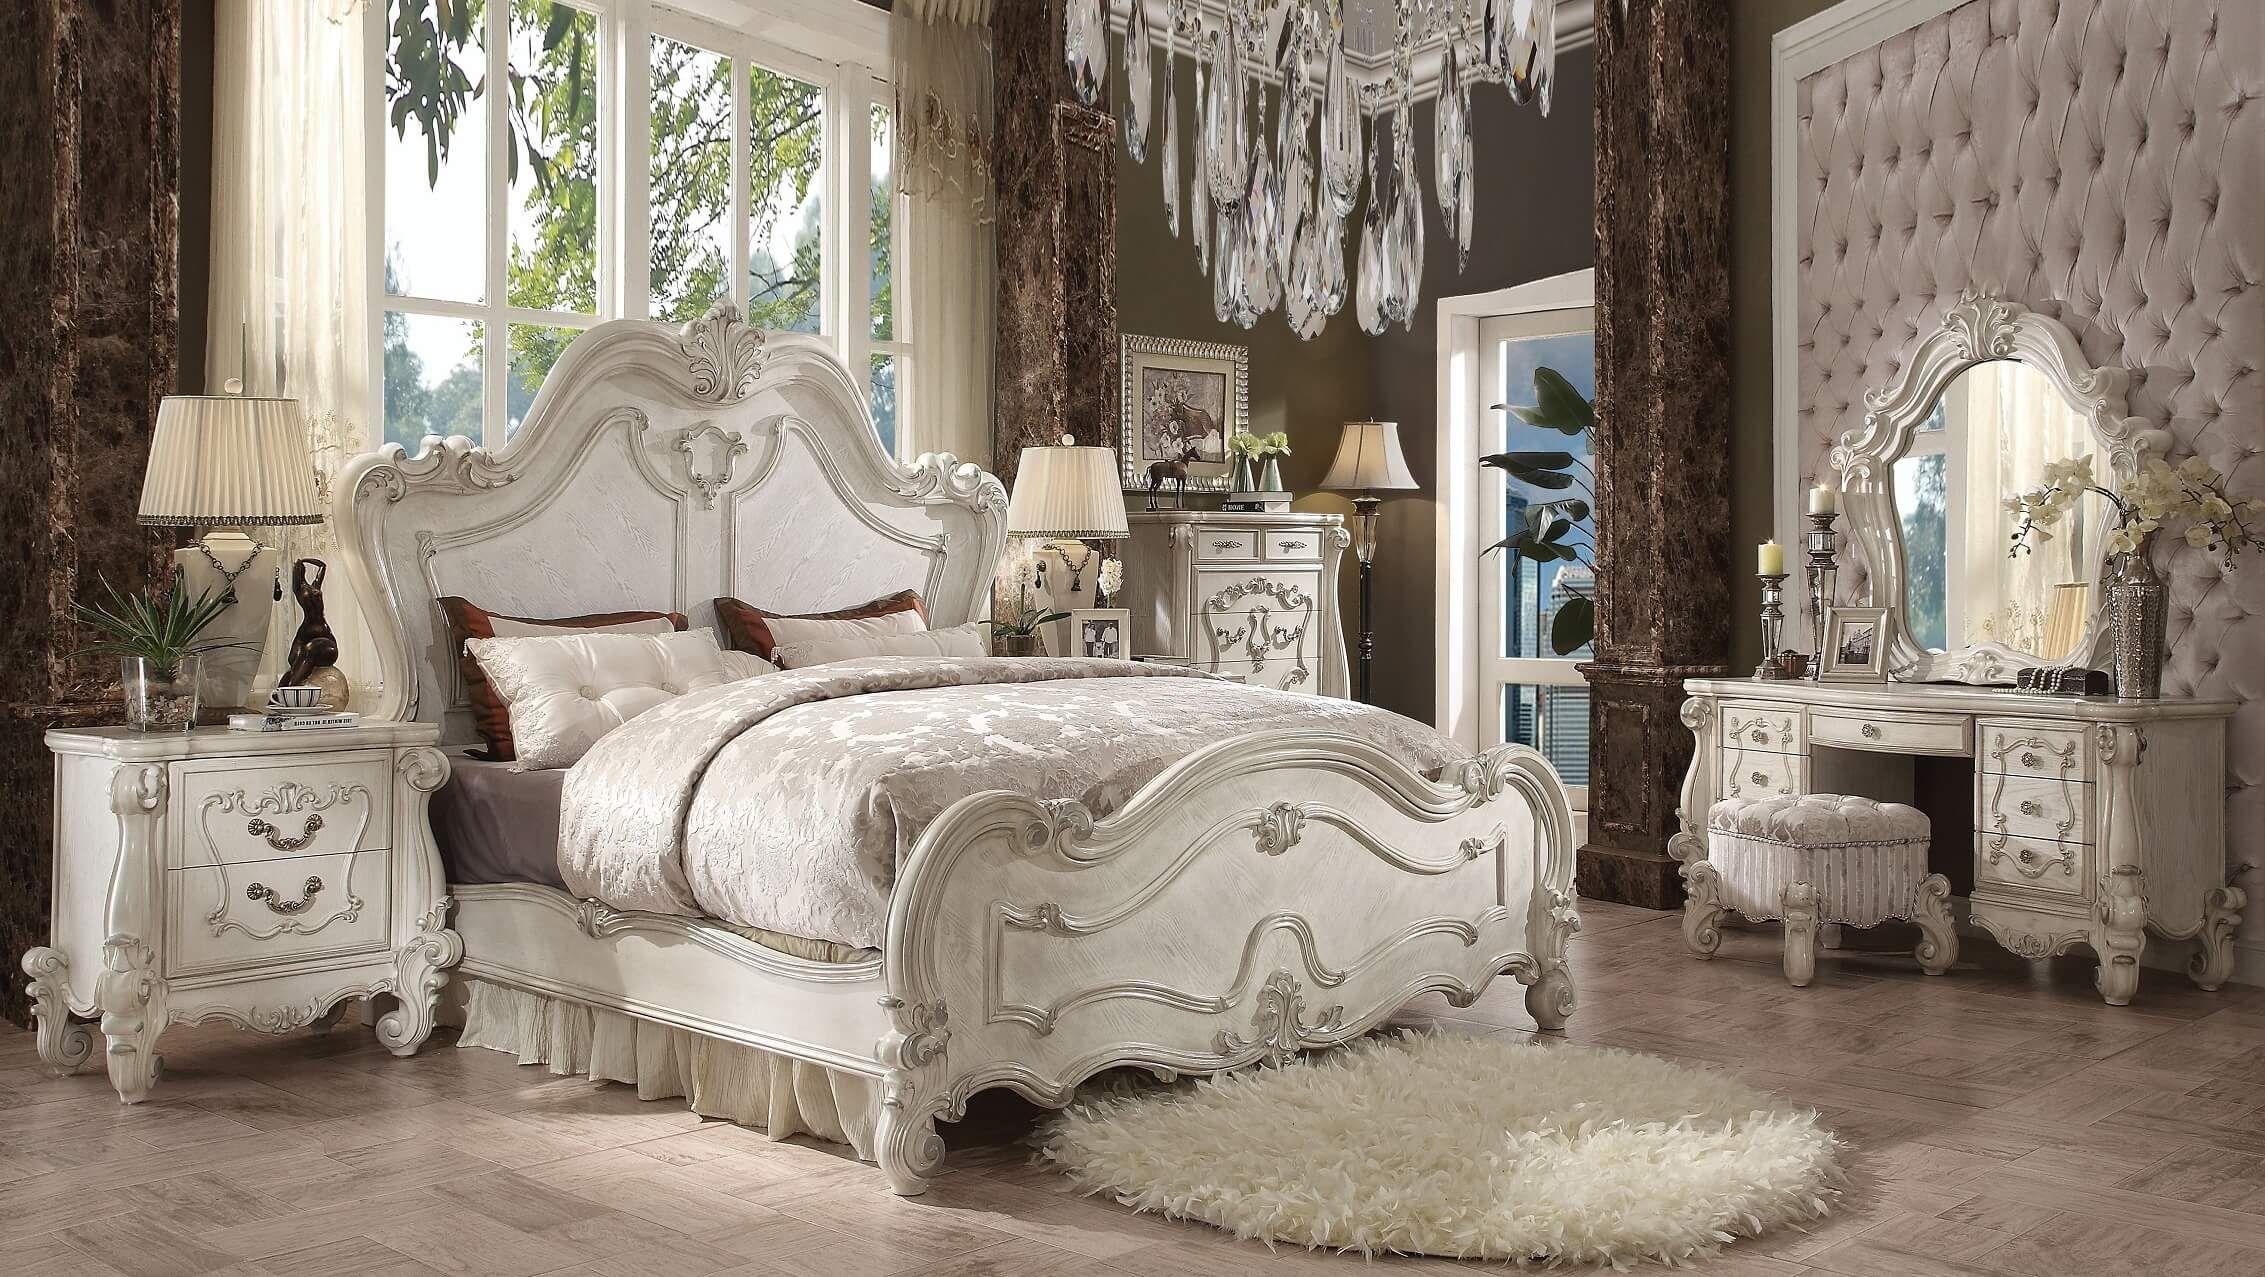 41+ Acme bedroom furniture information